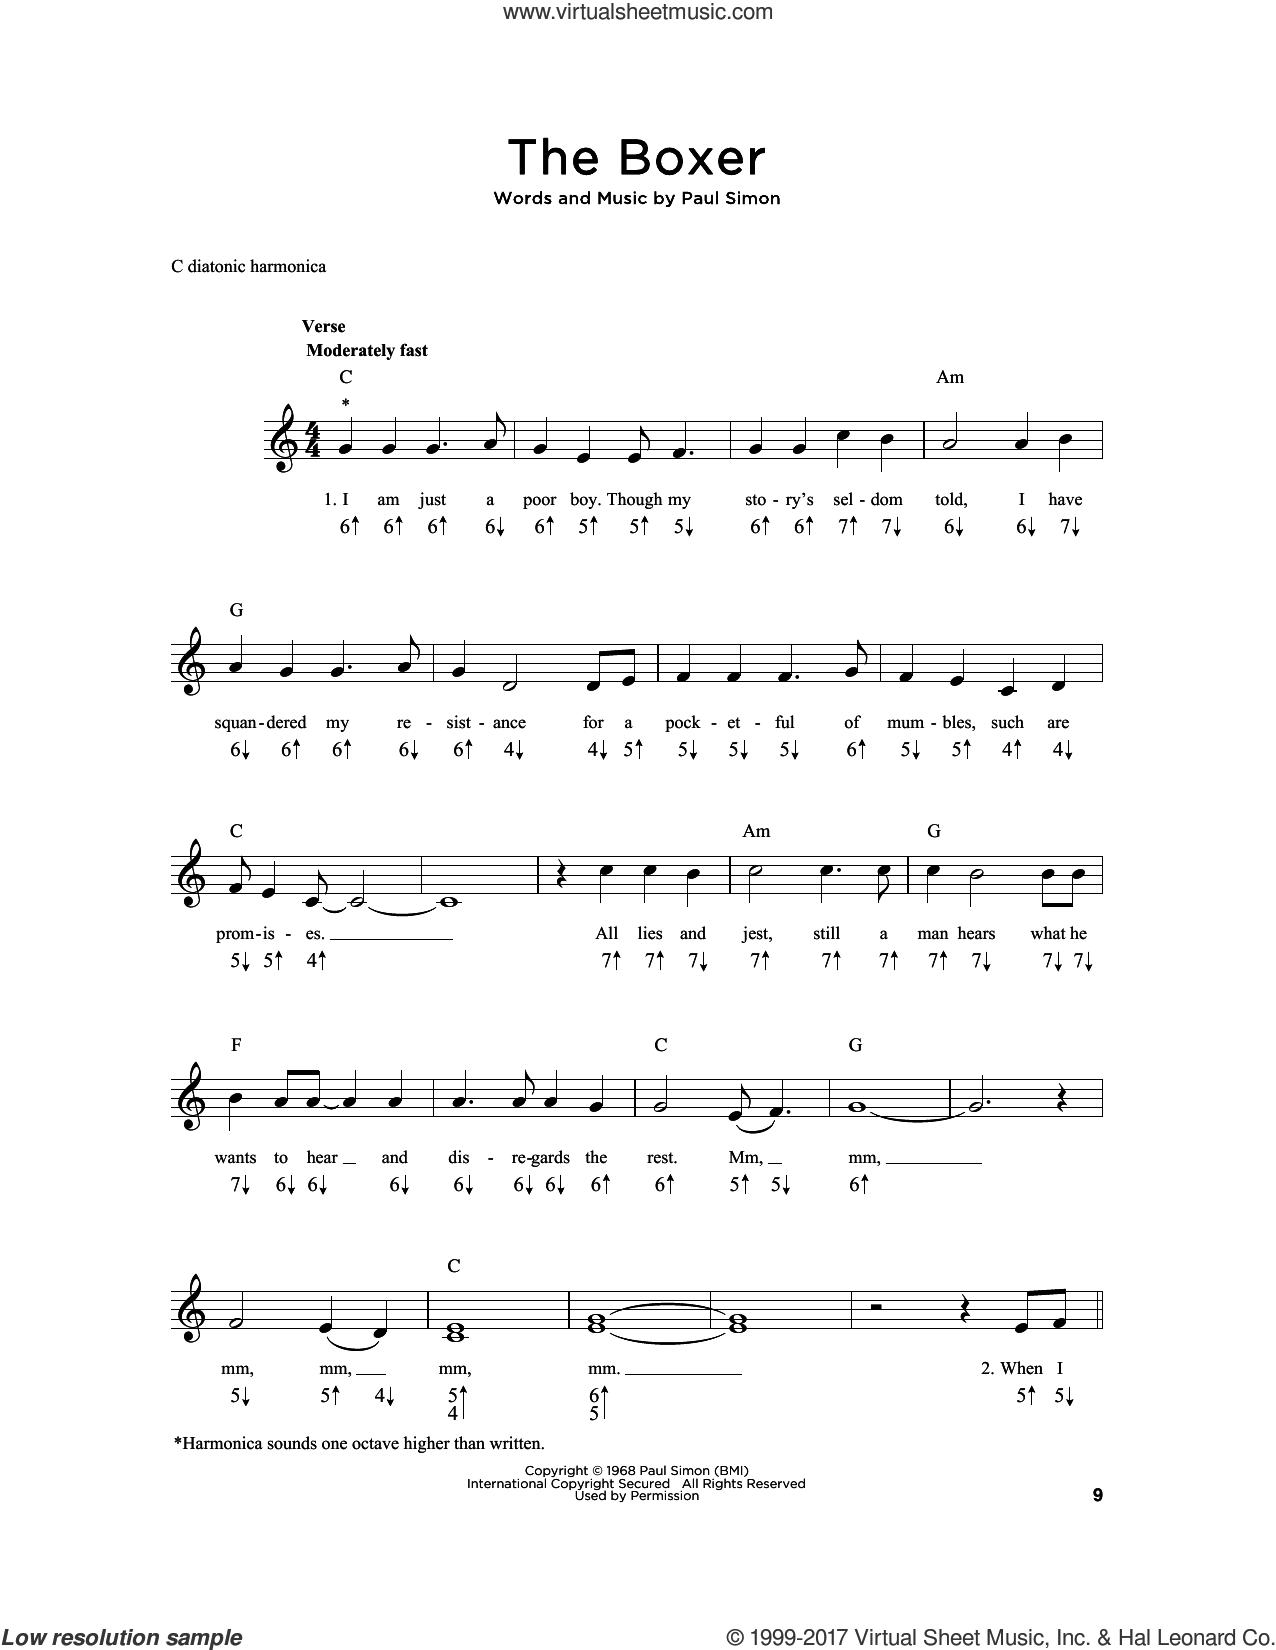 Garfunkel - The Boxer sheet music for harmonica solo [PDF]